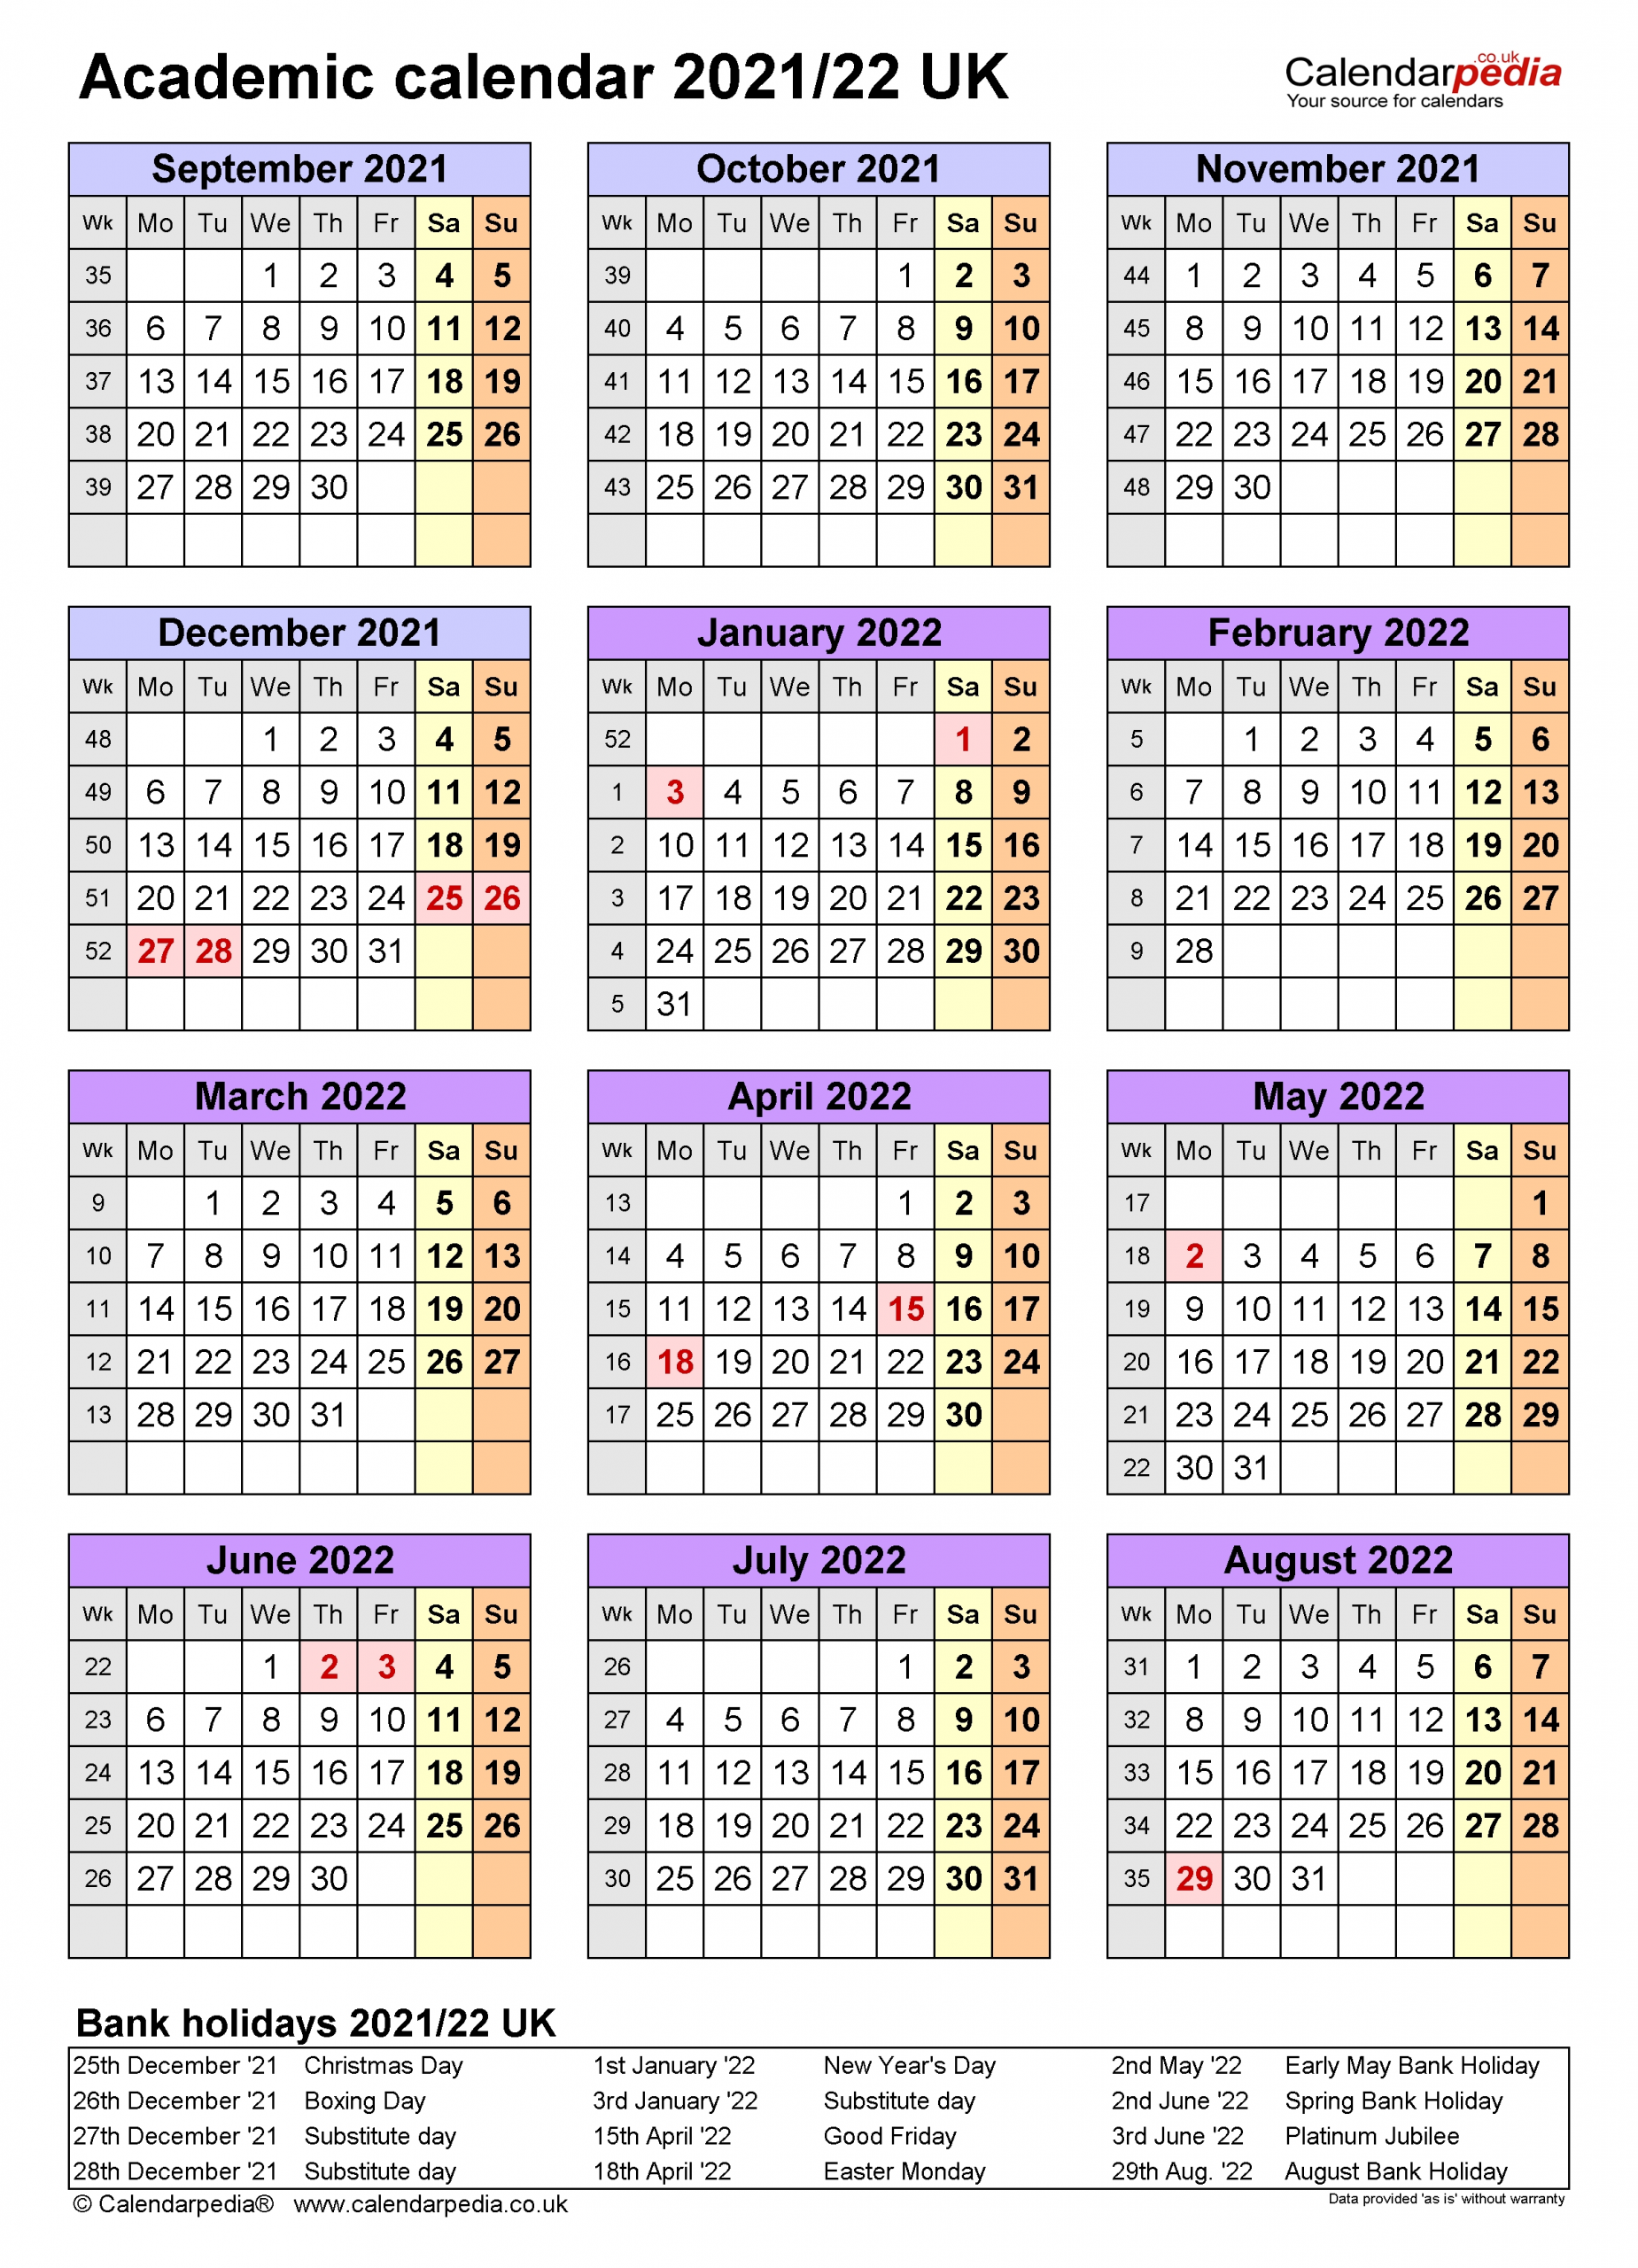 Academic Calendars 2021/22 Uk - Free Printable Excel Templates